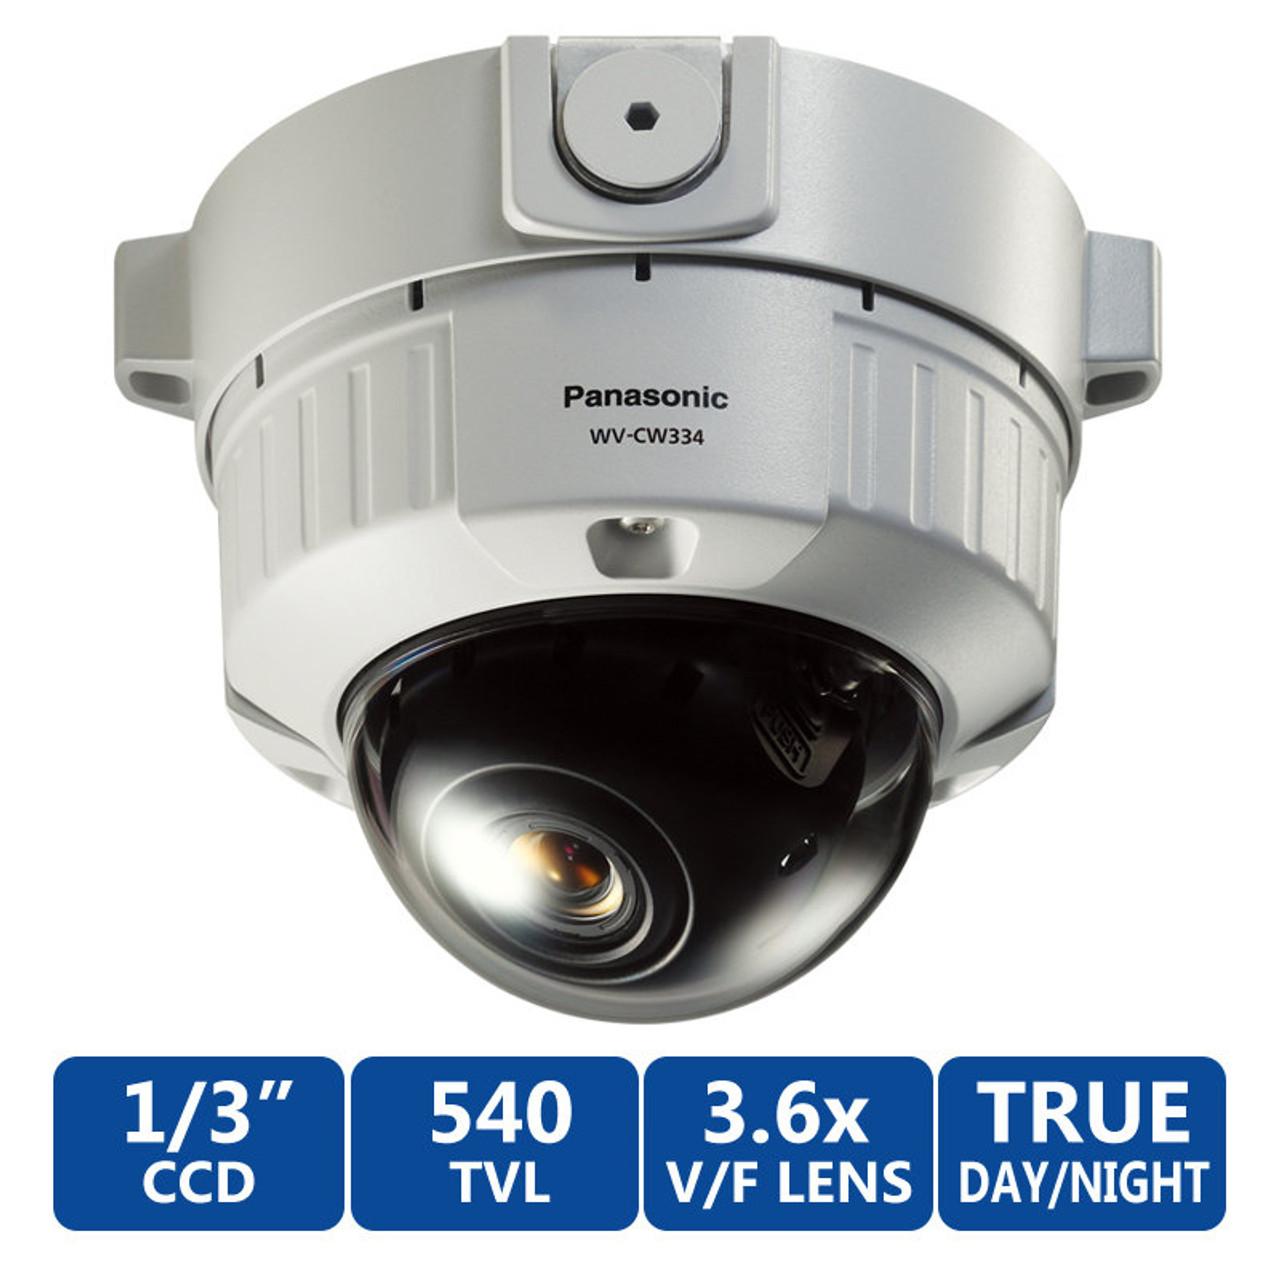 Panasonic WV CW334S 540tvl Day Night Vandal Proof Dome Security Camera